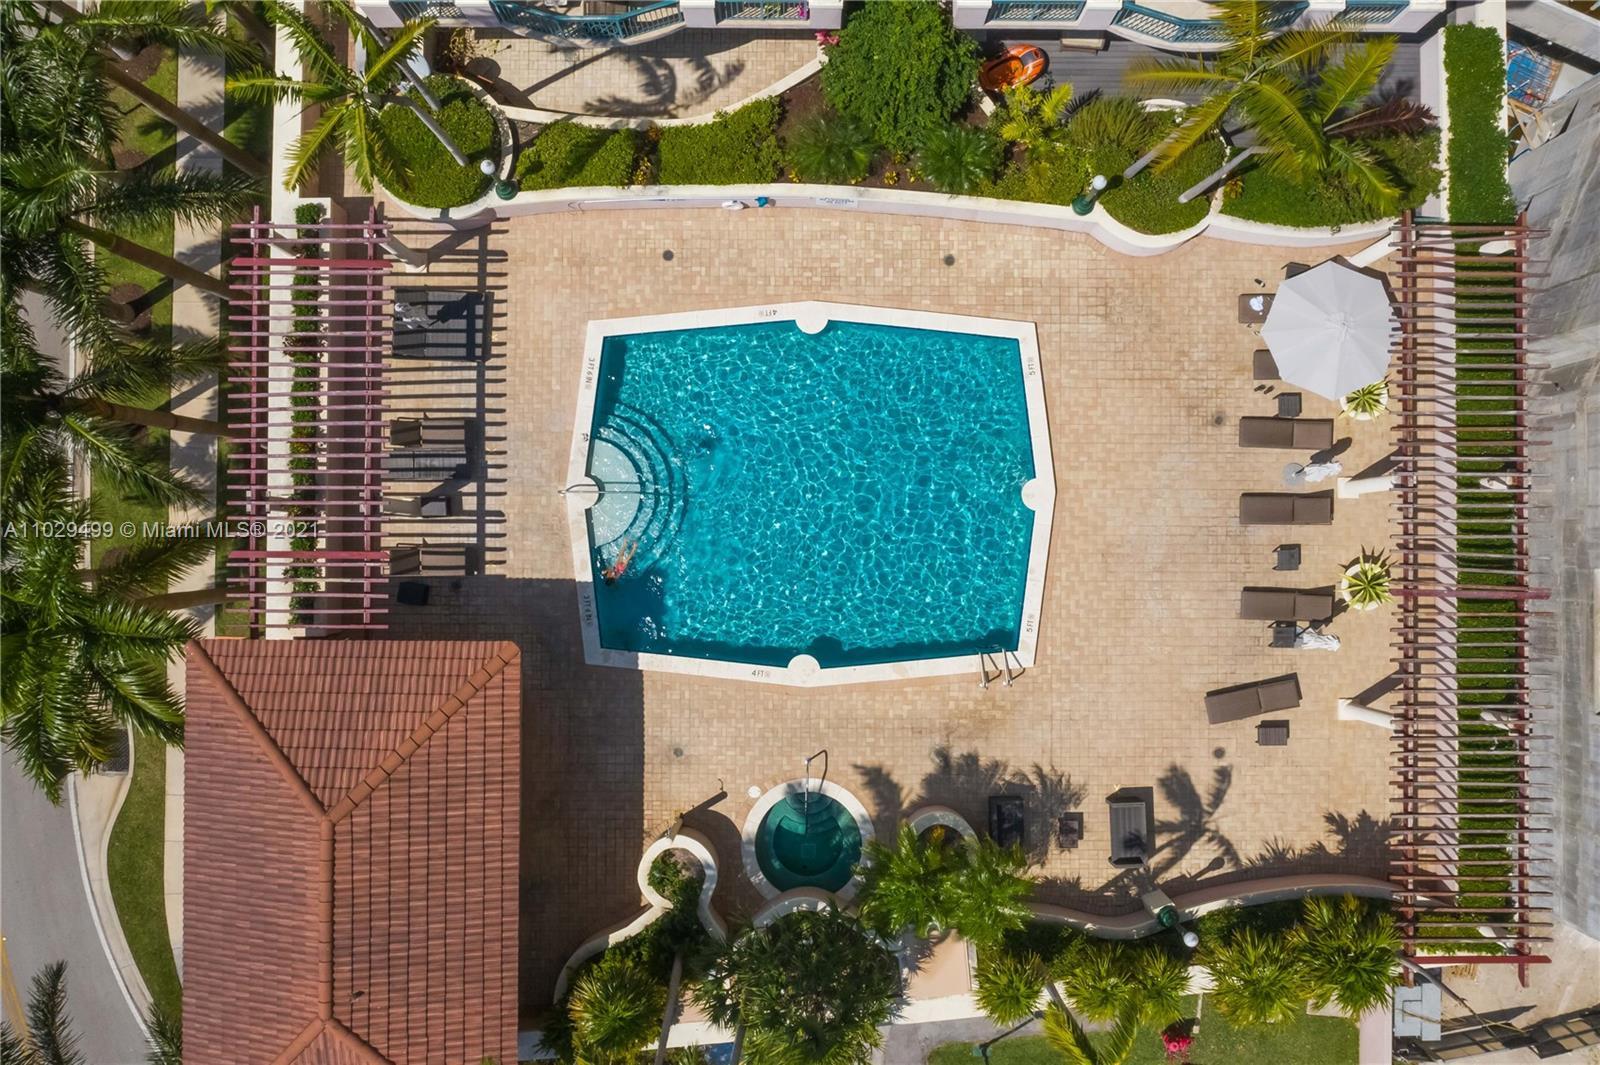 Photo of 17555 Atlantic Blvd #503, Sunny Isles Beach, Florida, 33160 - Close to the beautiful Sunny Isles Beach.